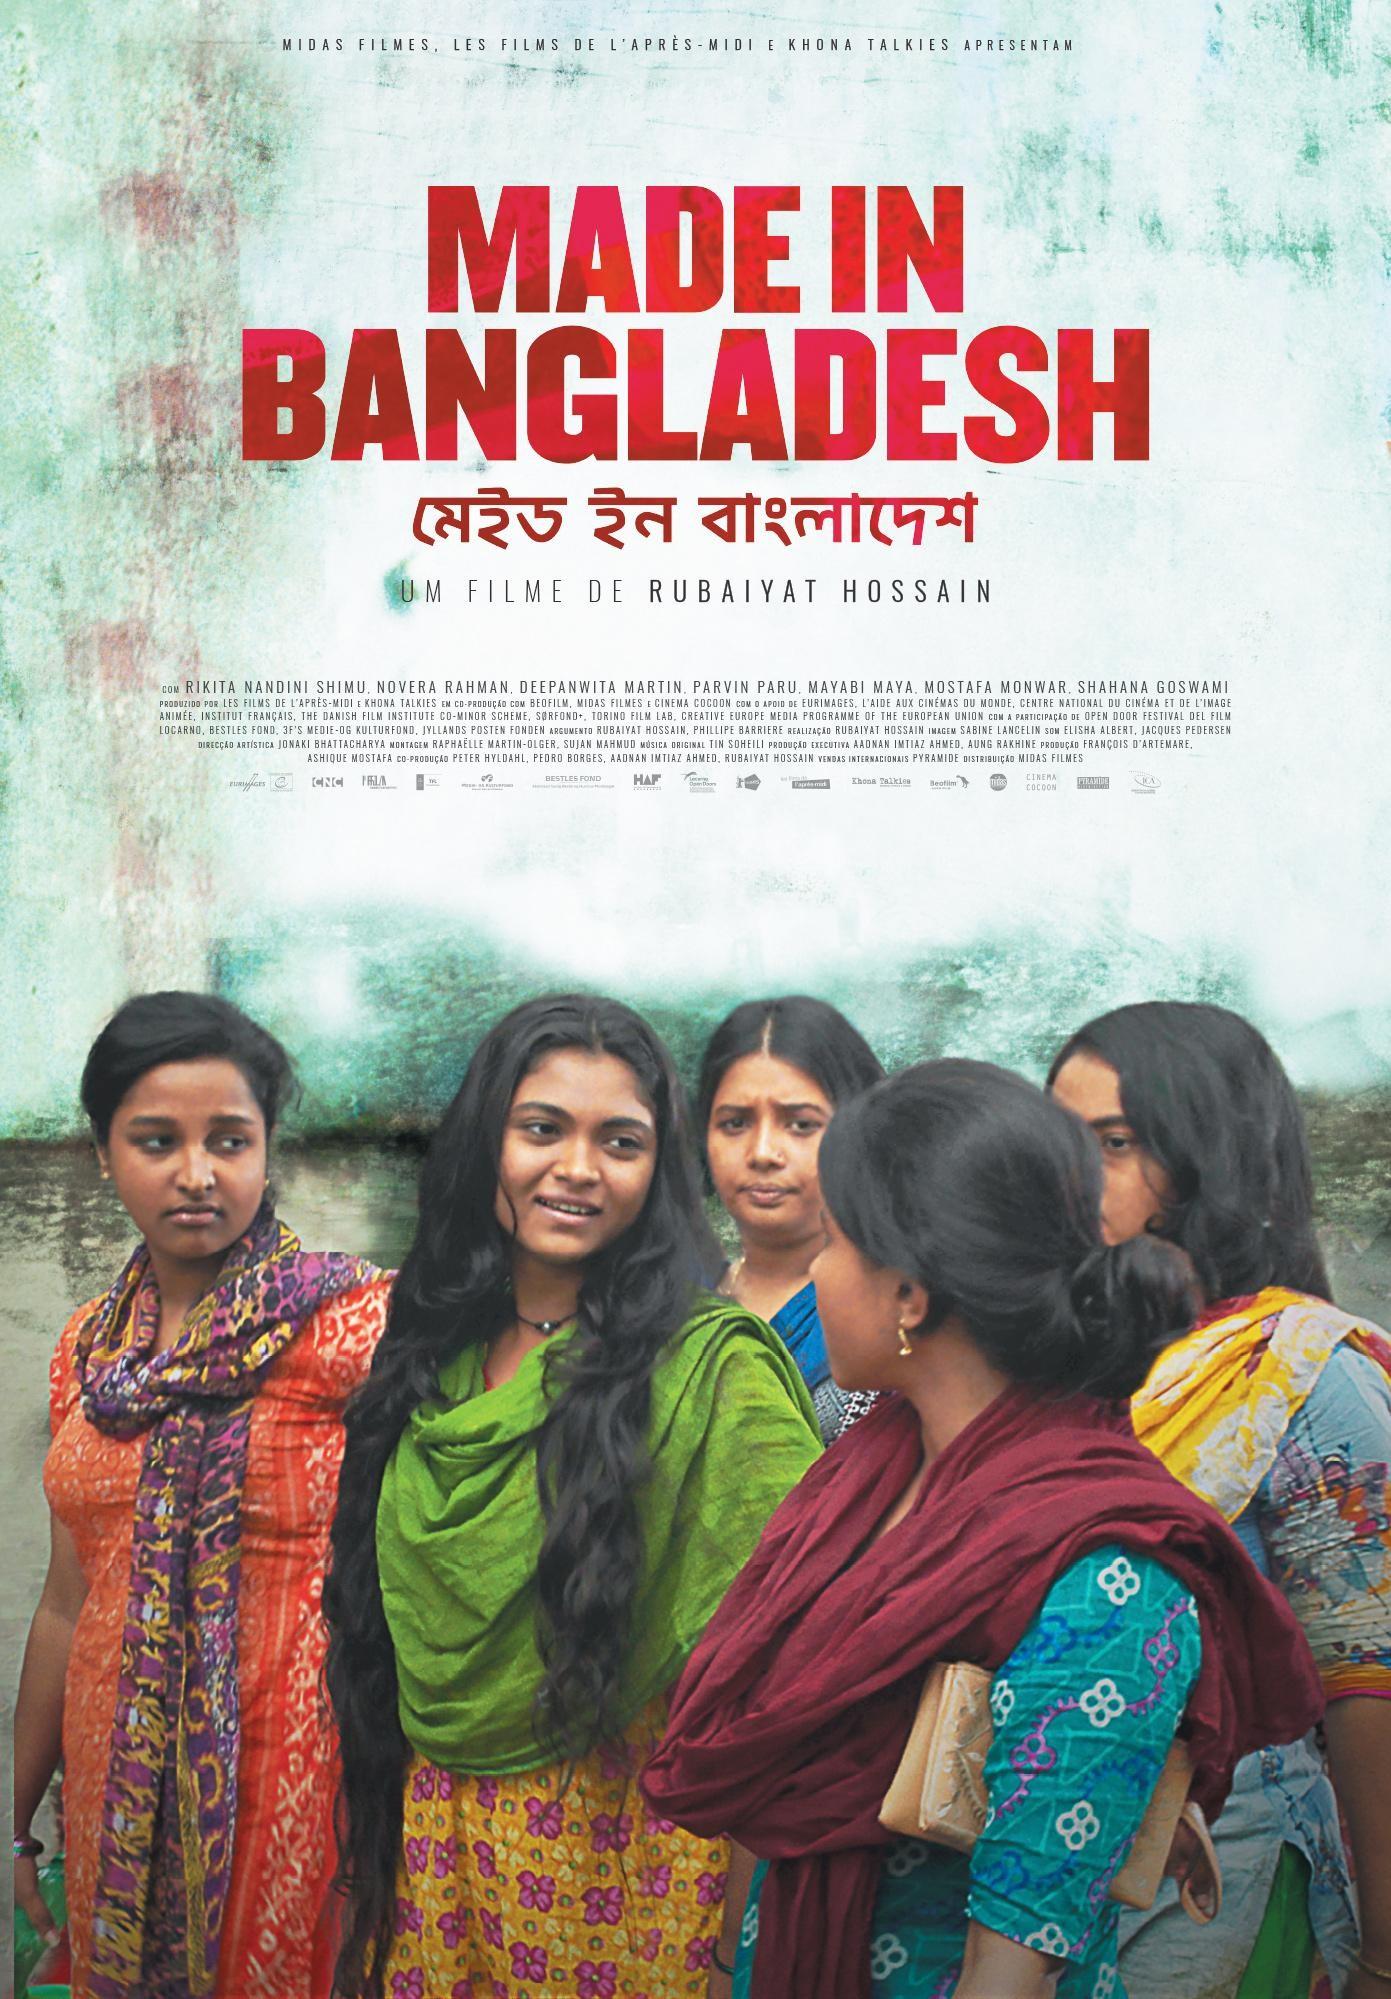 Cinema | MADE IN BANGLADESH